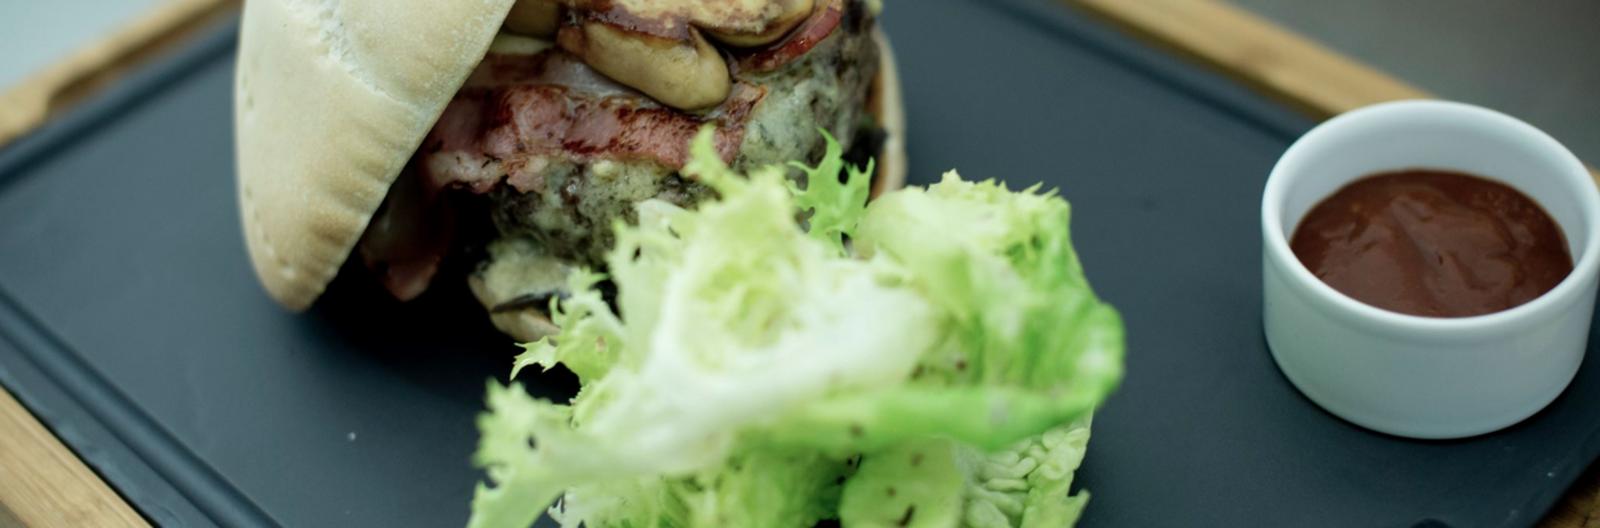 Budapest legjobb hamburgerei